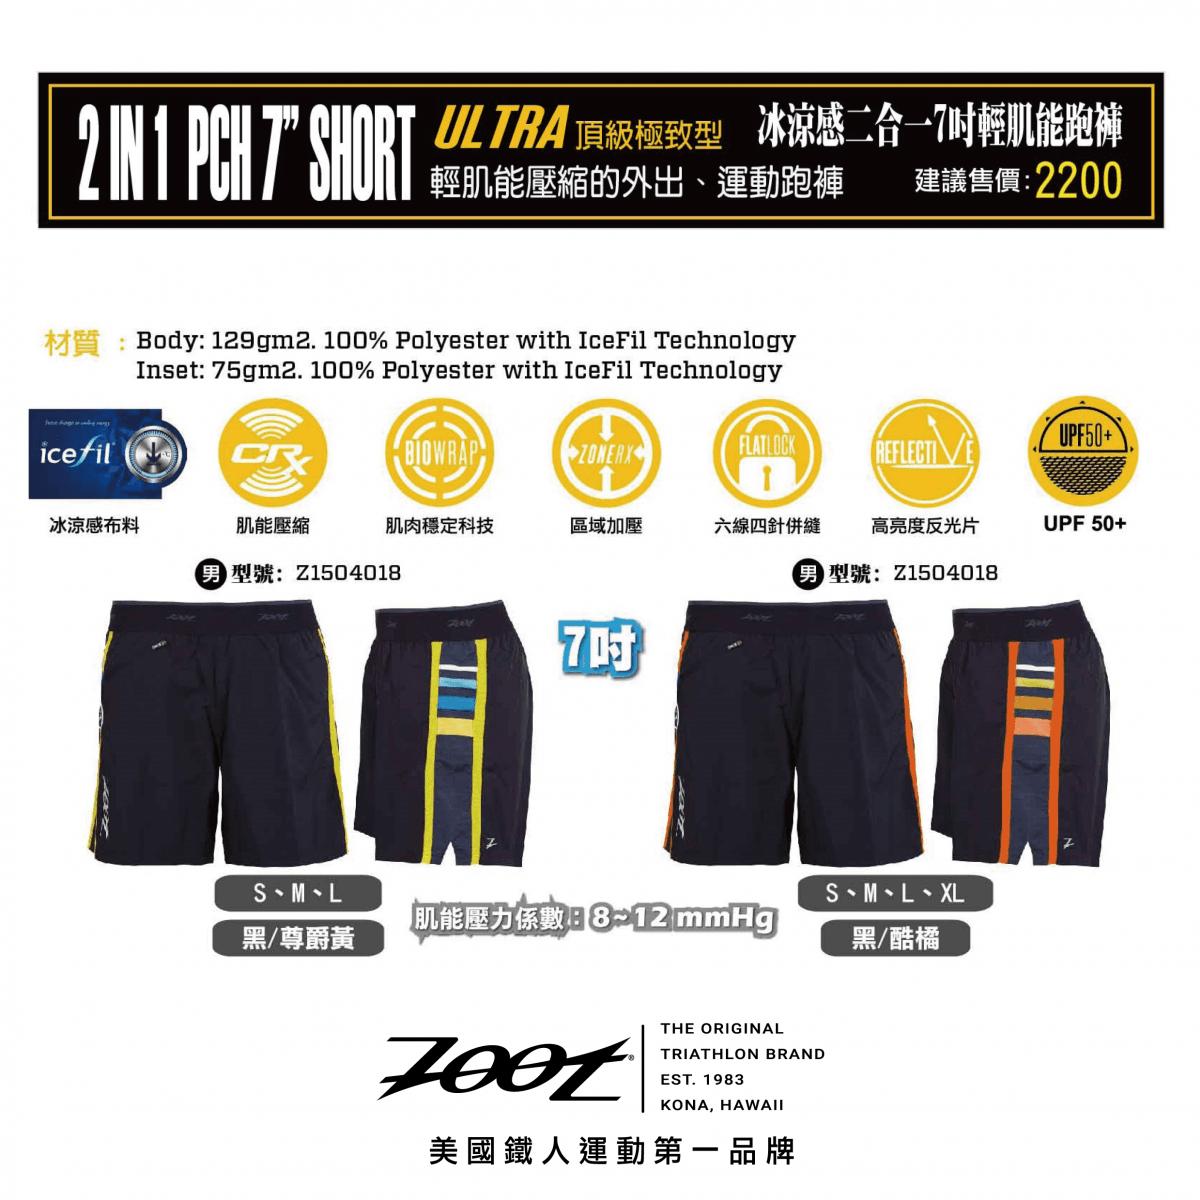 【ZOOT】 冰涼感二合一7吋輕肌能跑褲 (男) 0